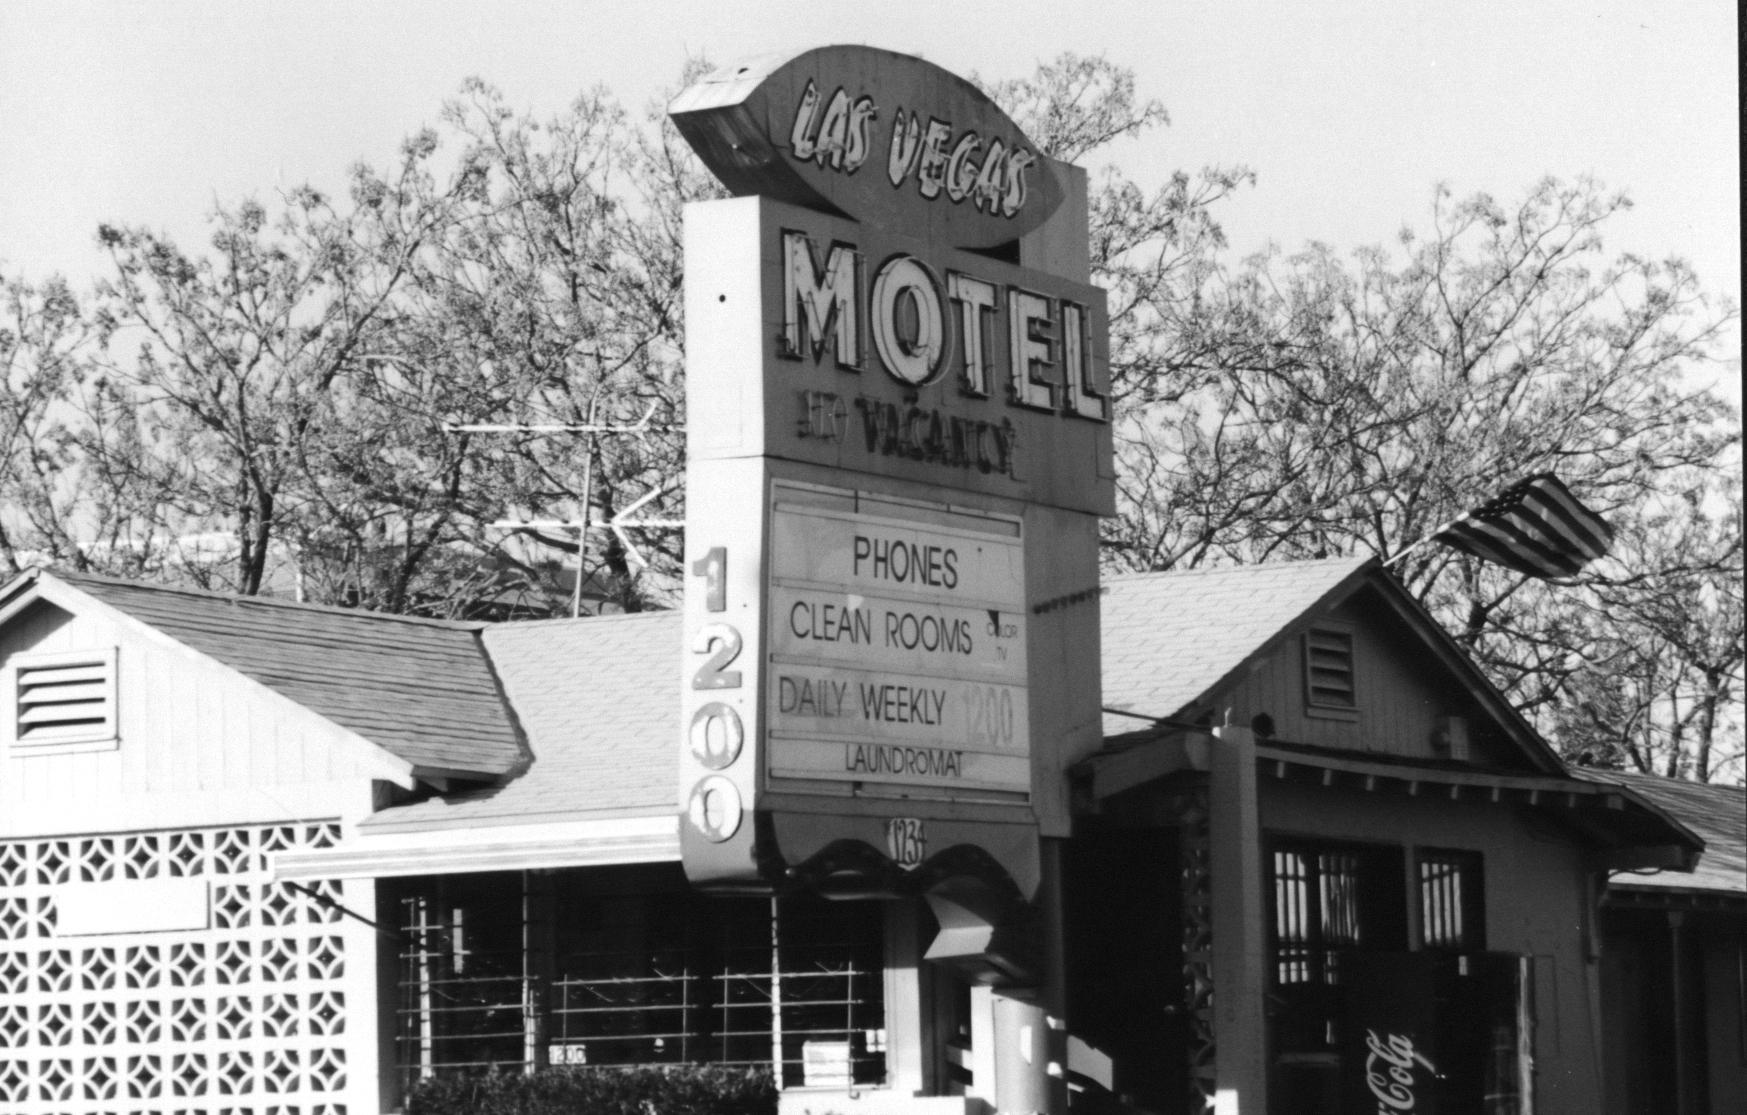 Las Vegas Motel Sign.jpg